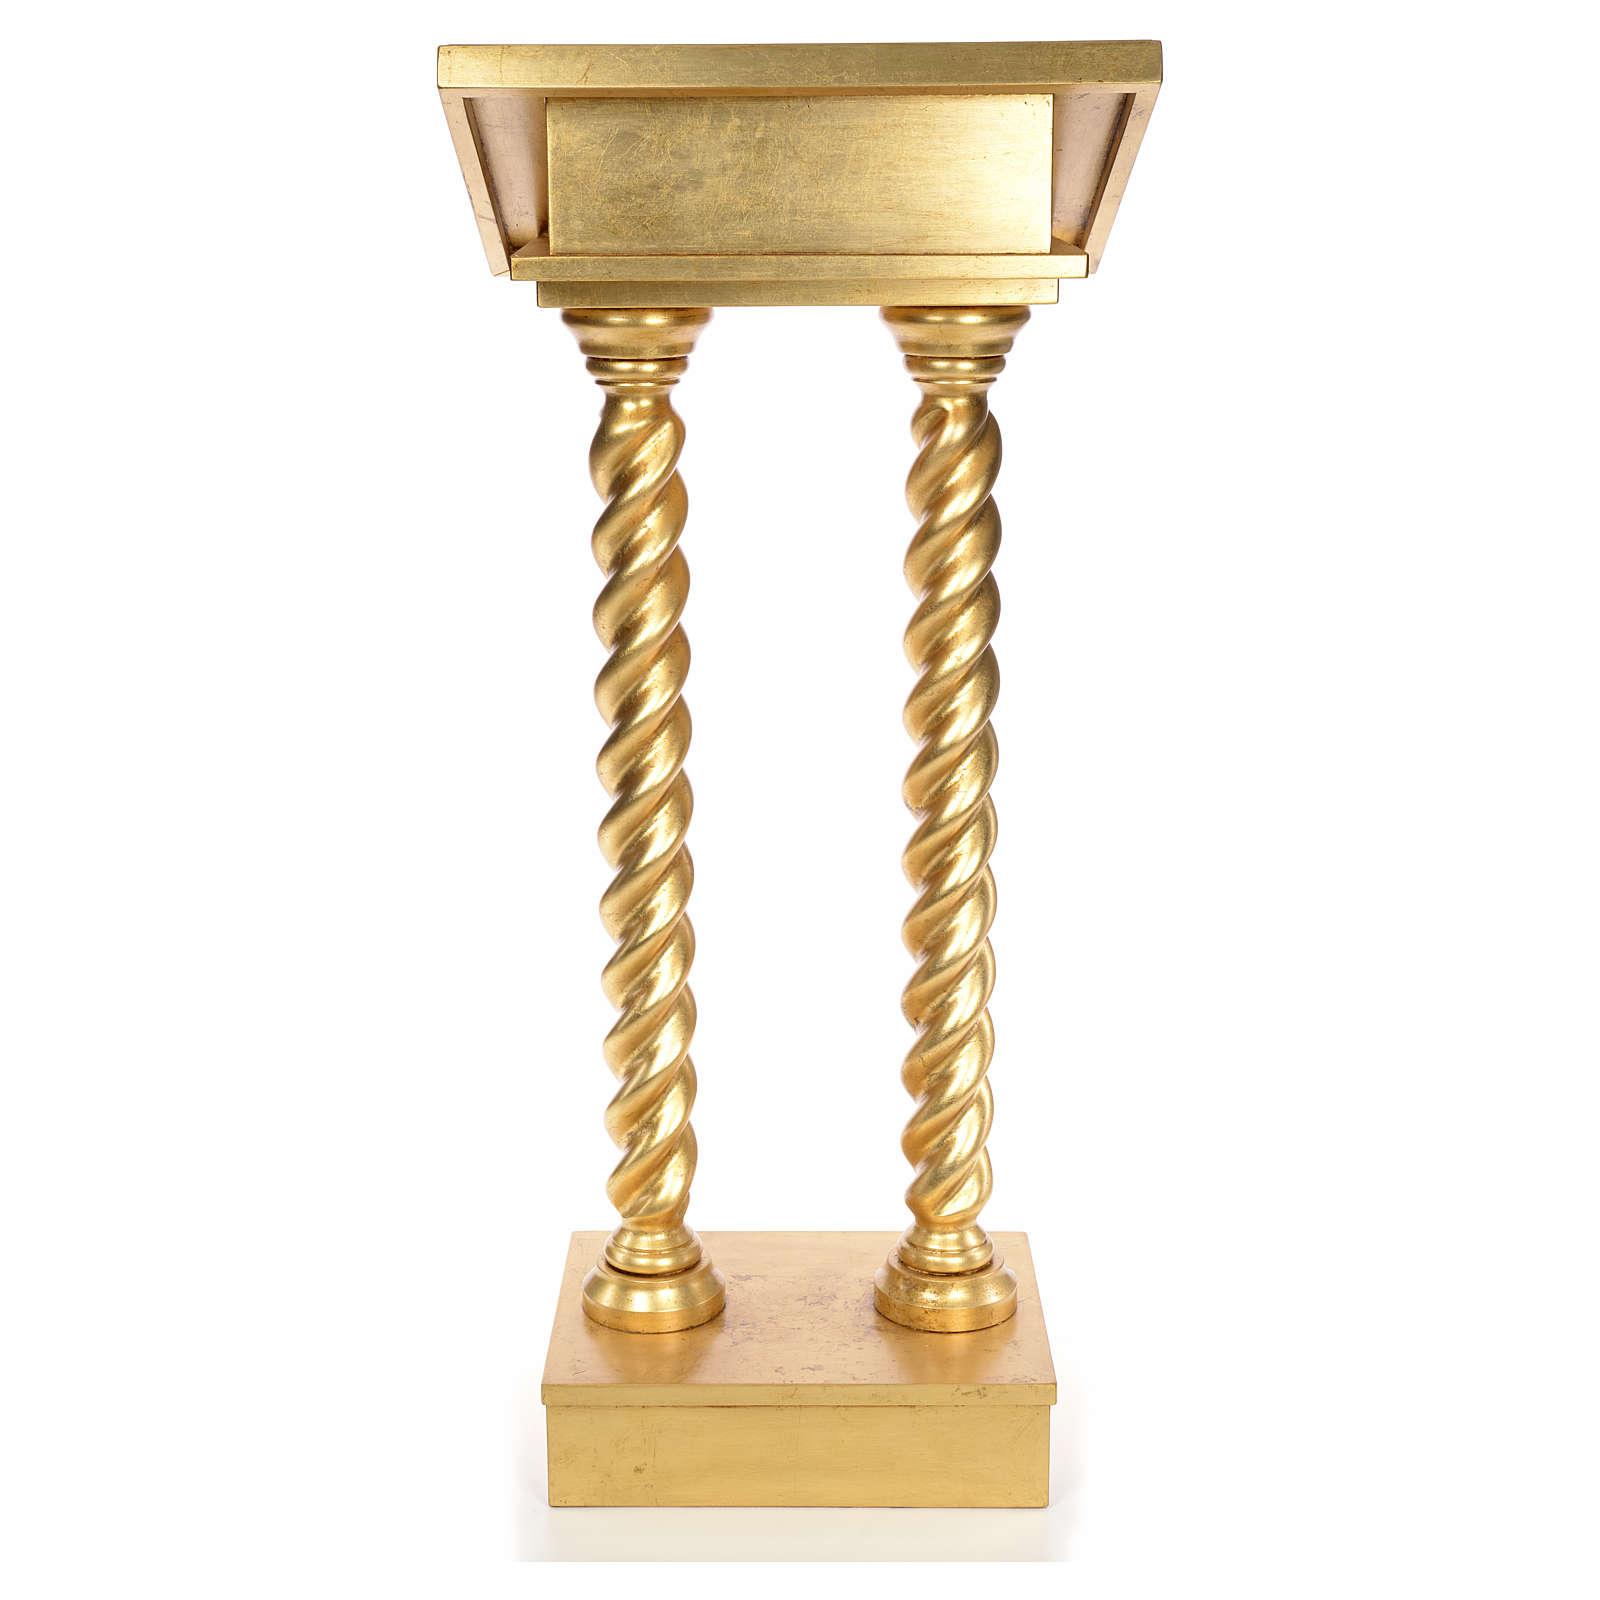 Lectern in beech wood, 2 columns spiraling pattern, gold foil 4